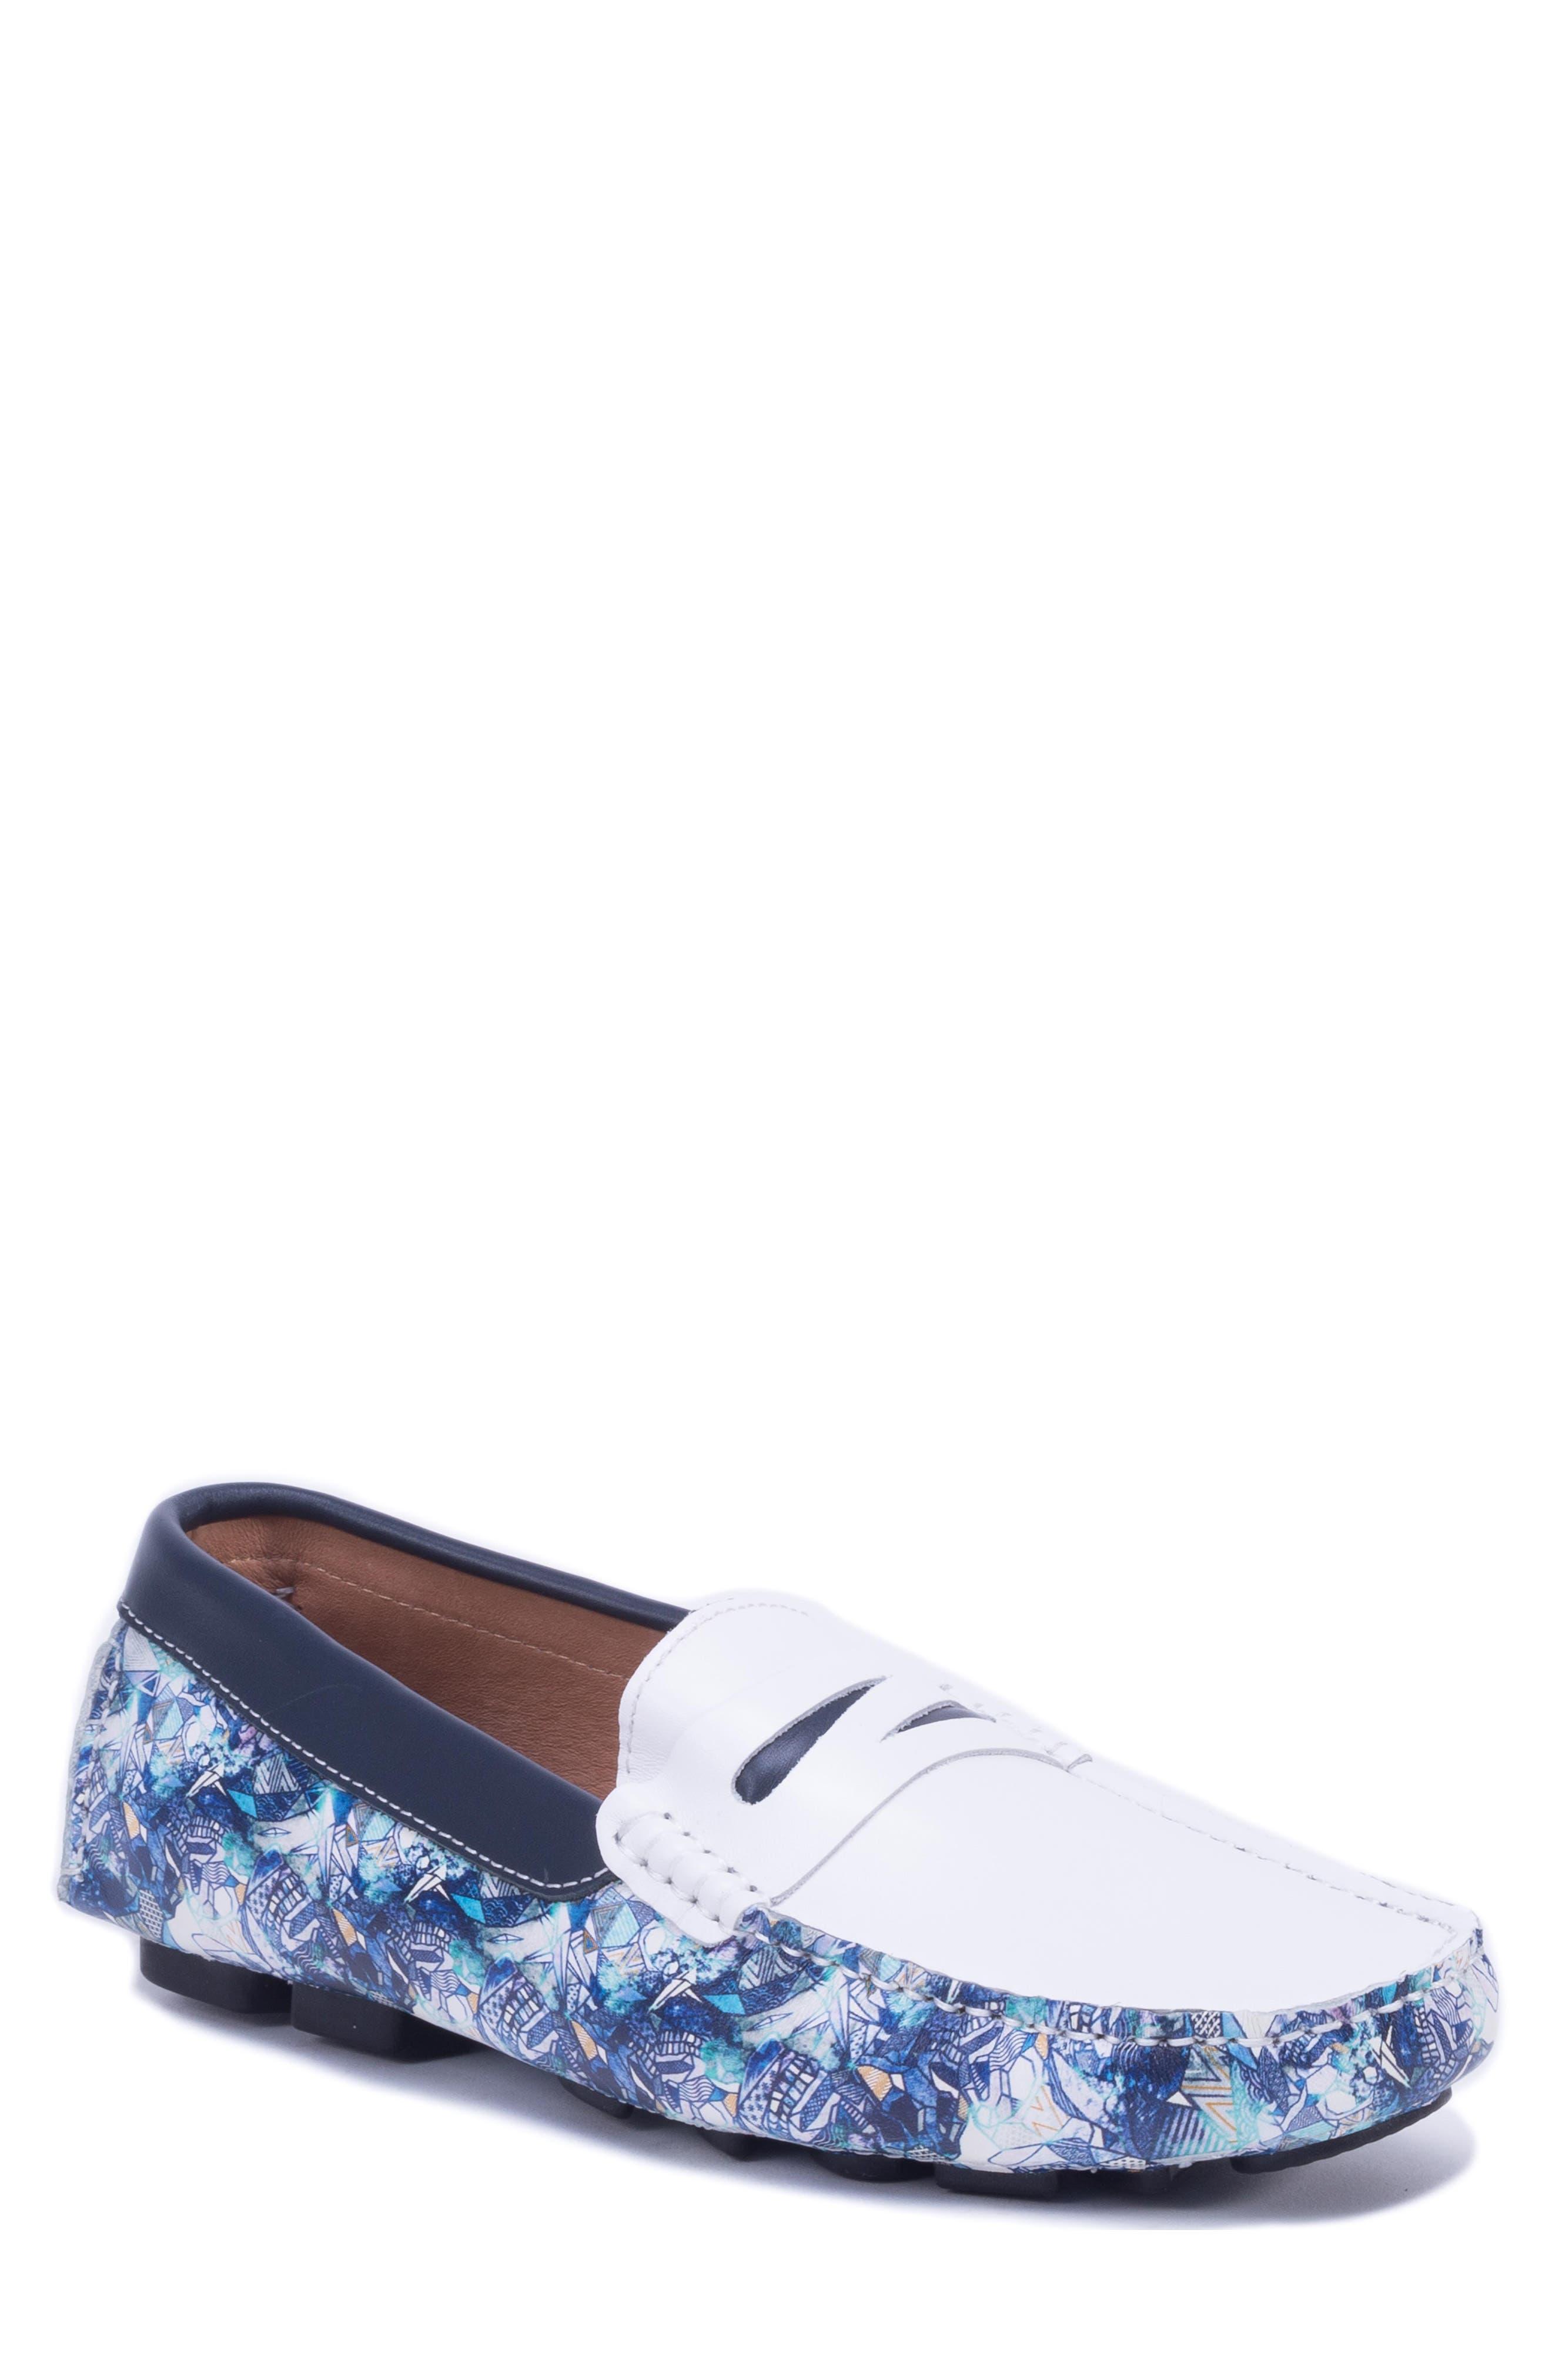 Doggerland Driving Shoe,                             Main thumbnail 1, color,                             WHITE LEATHER